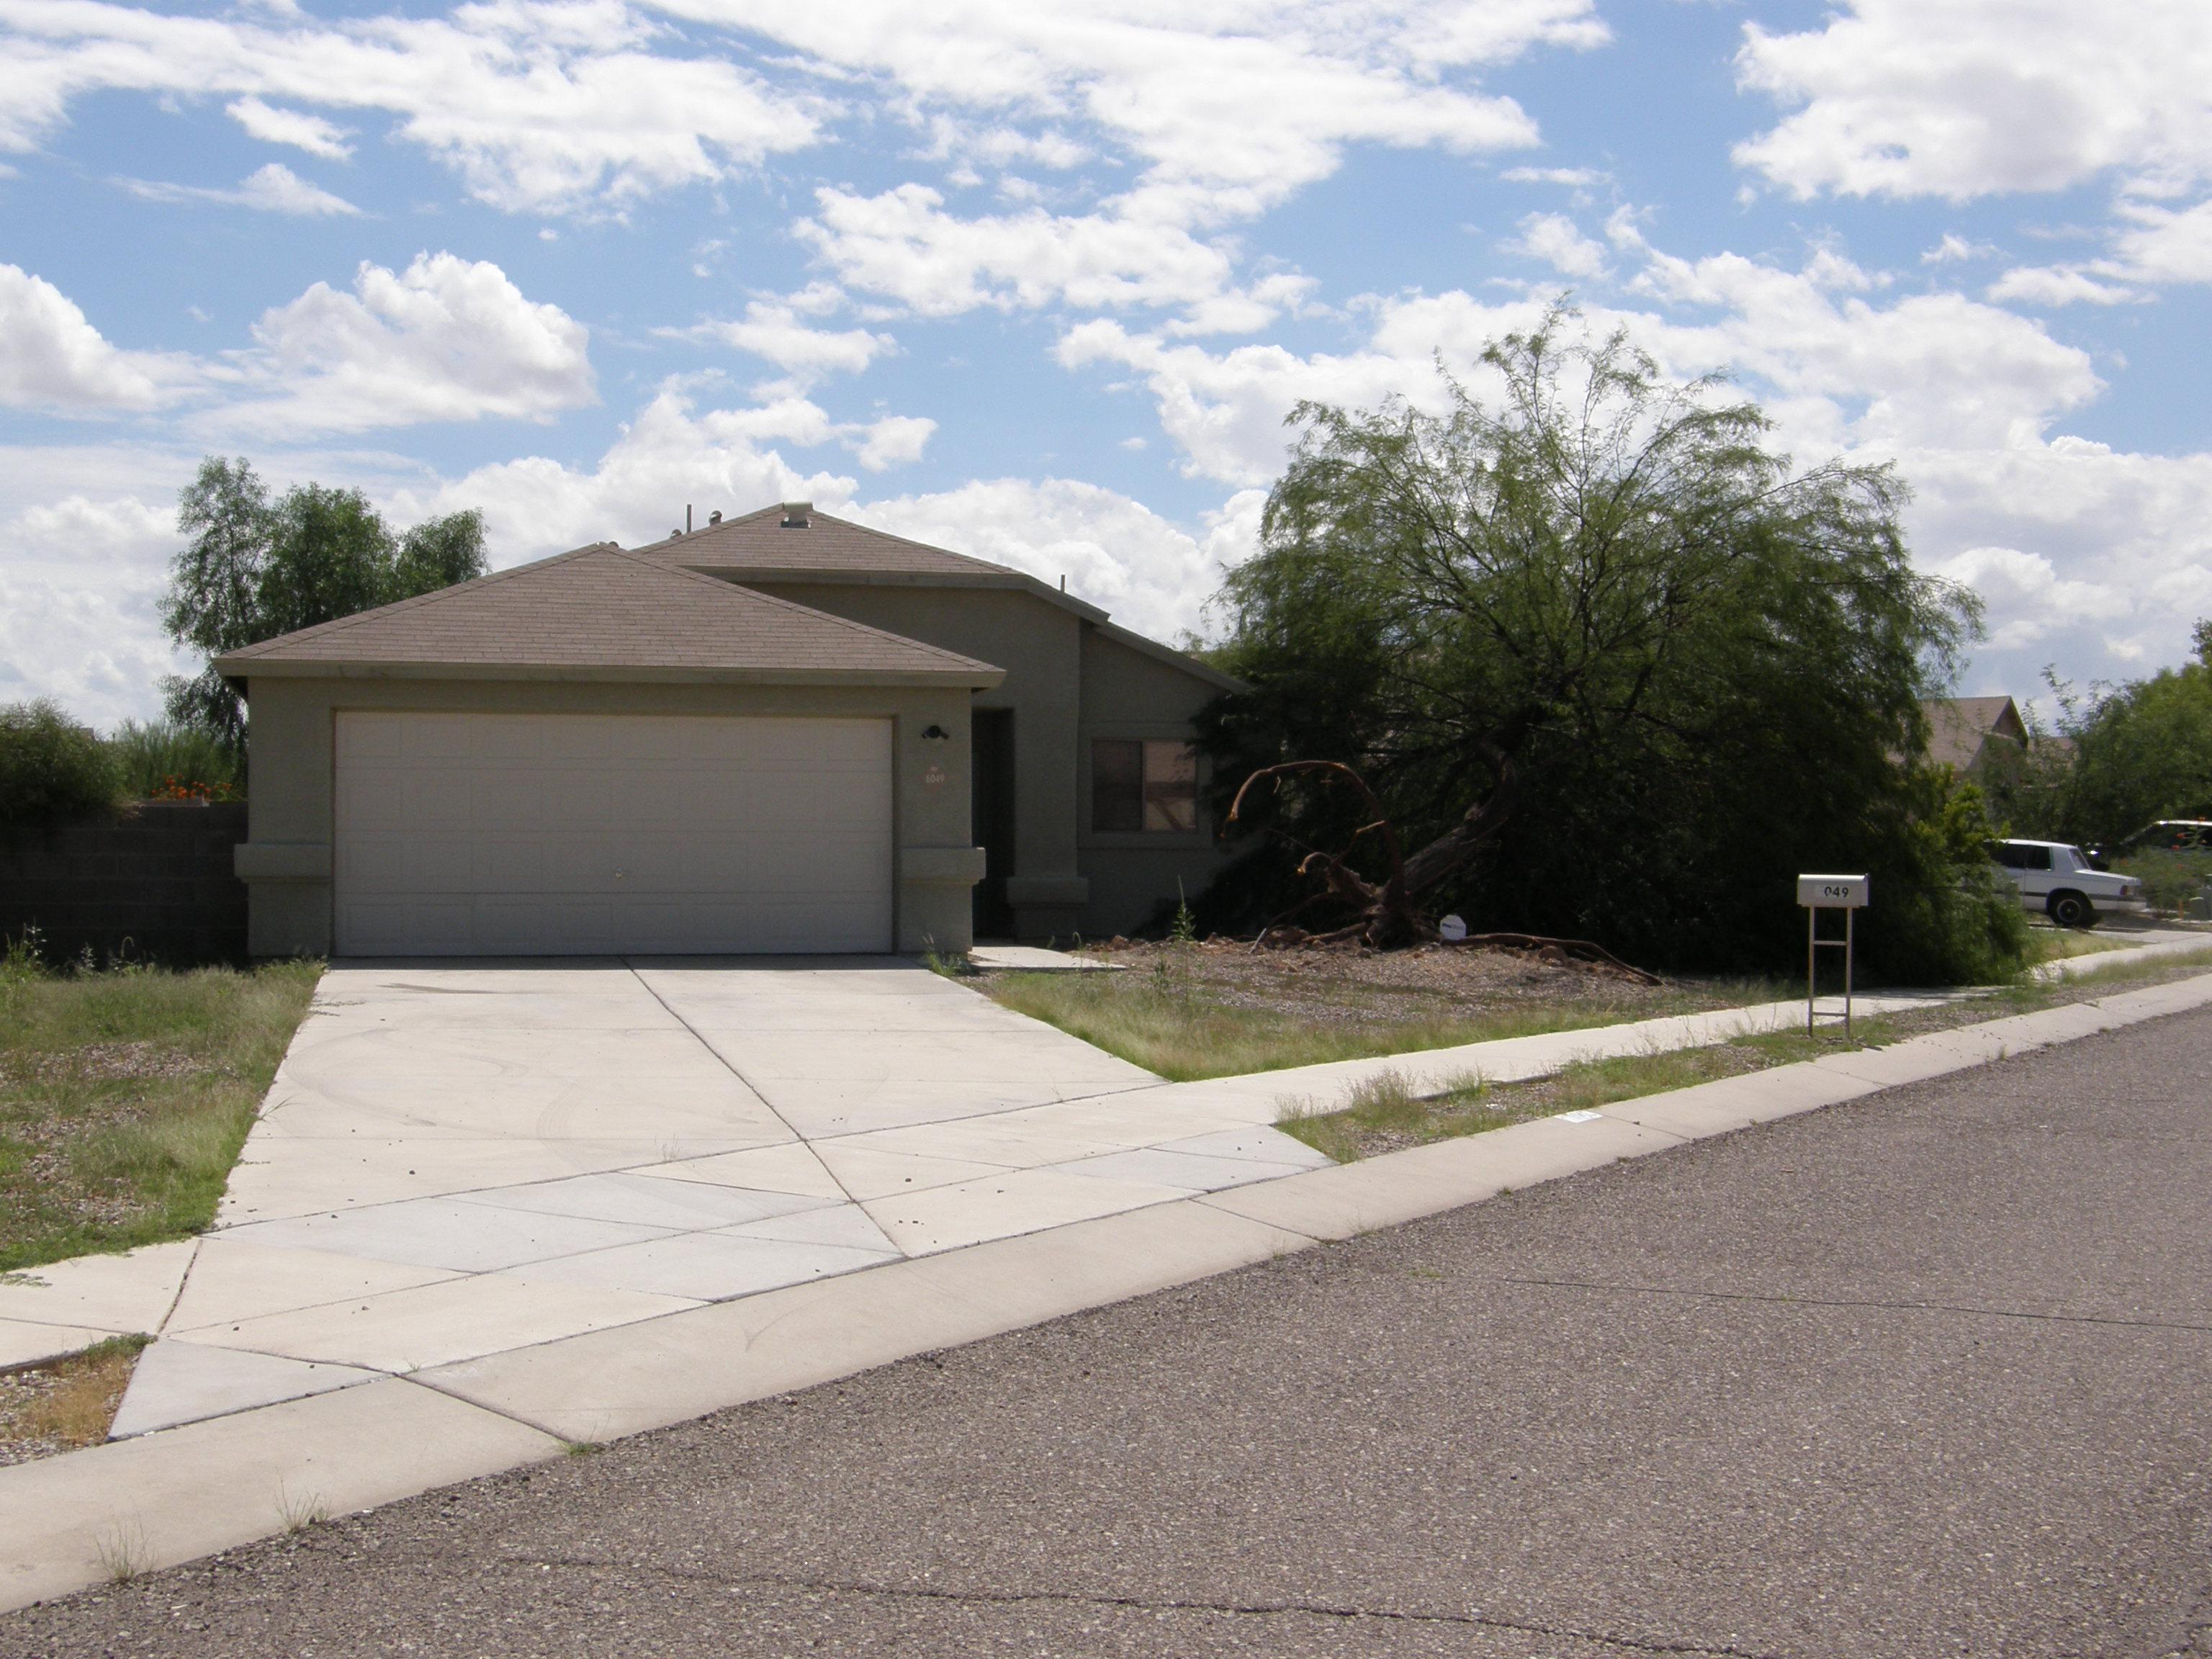 6049 south nantac rim drive tucson az 85706 foreclosed